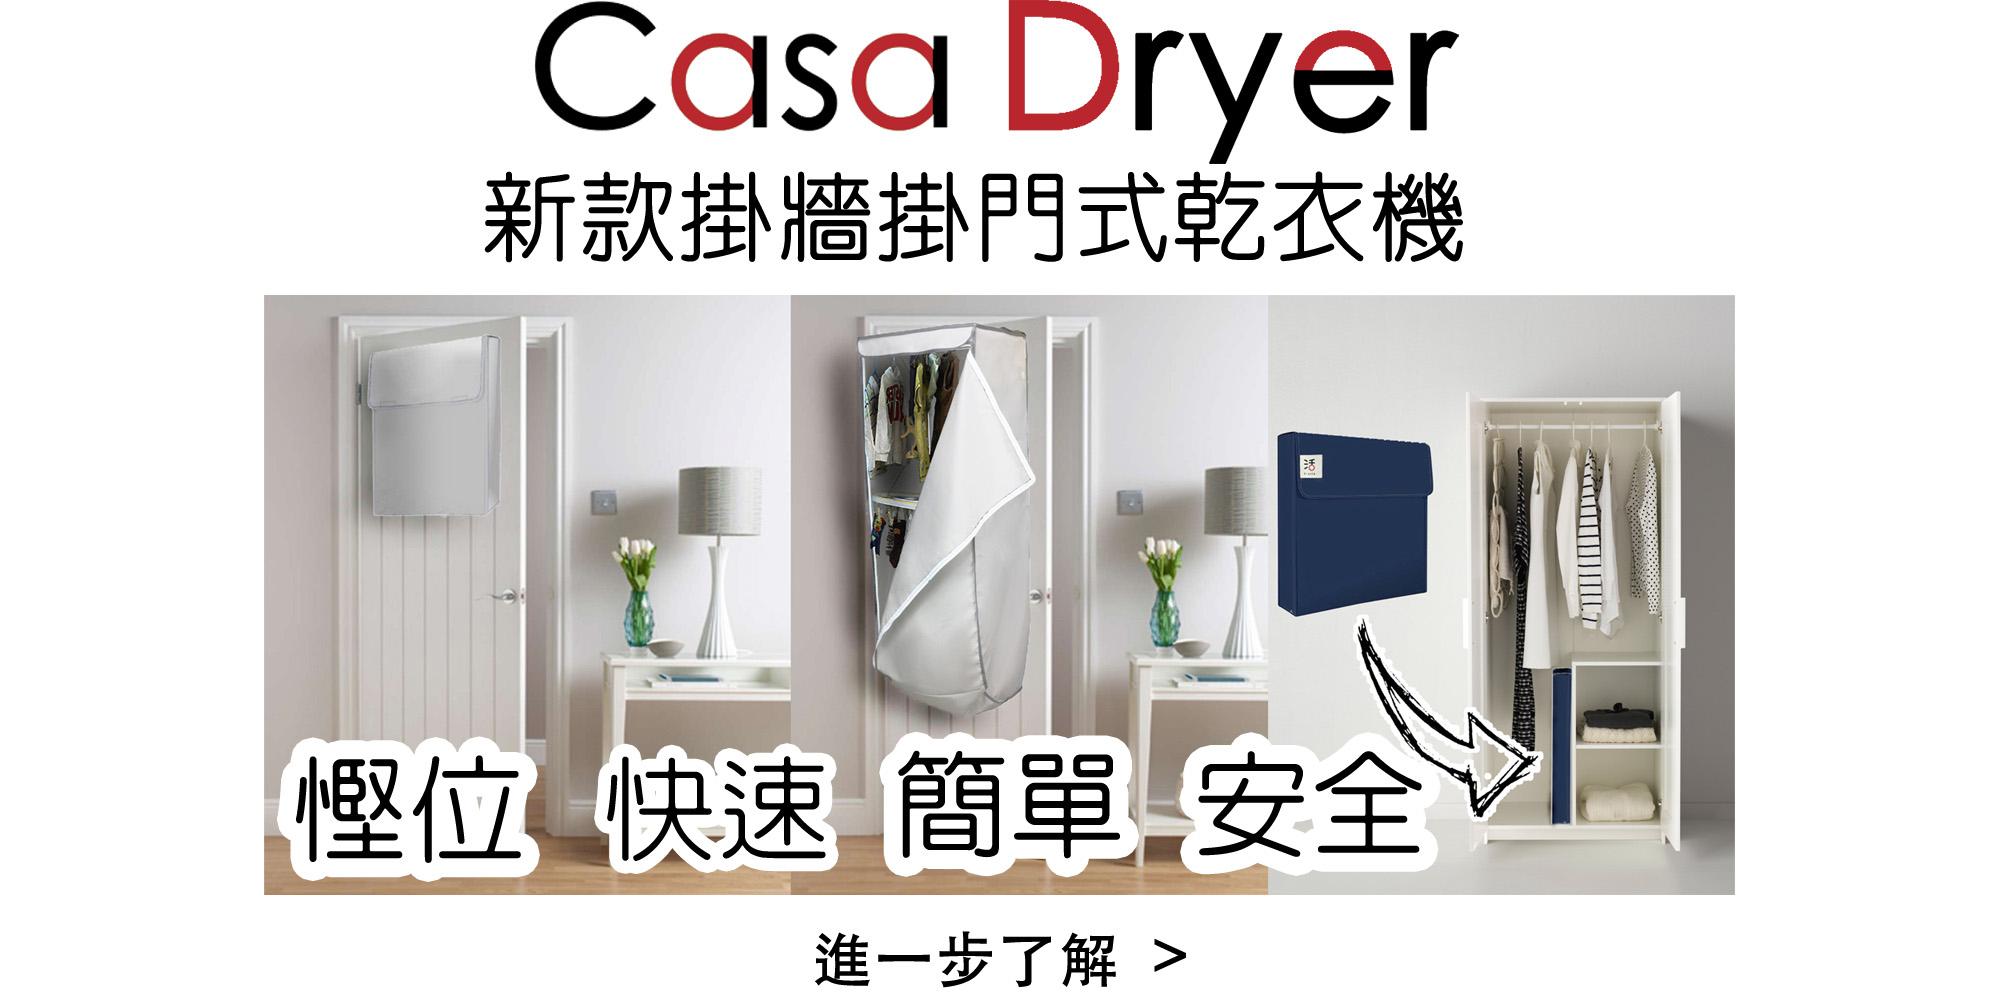 Casa Dryer